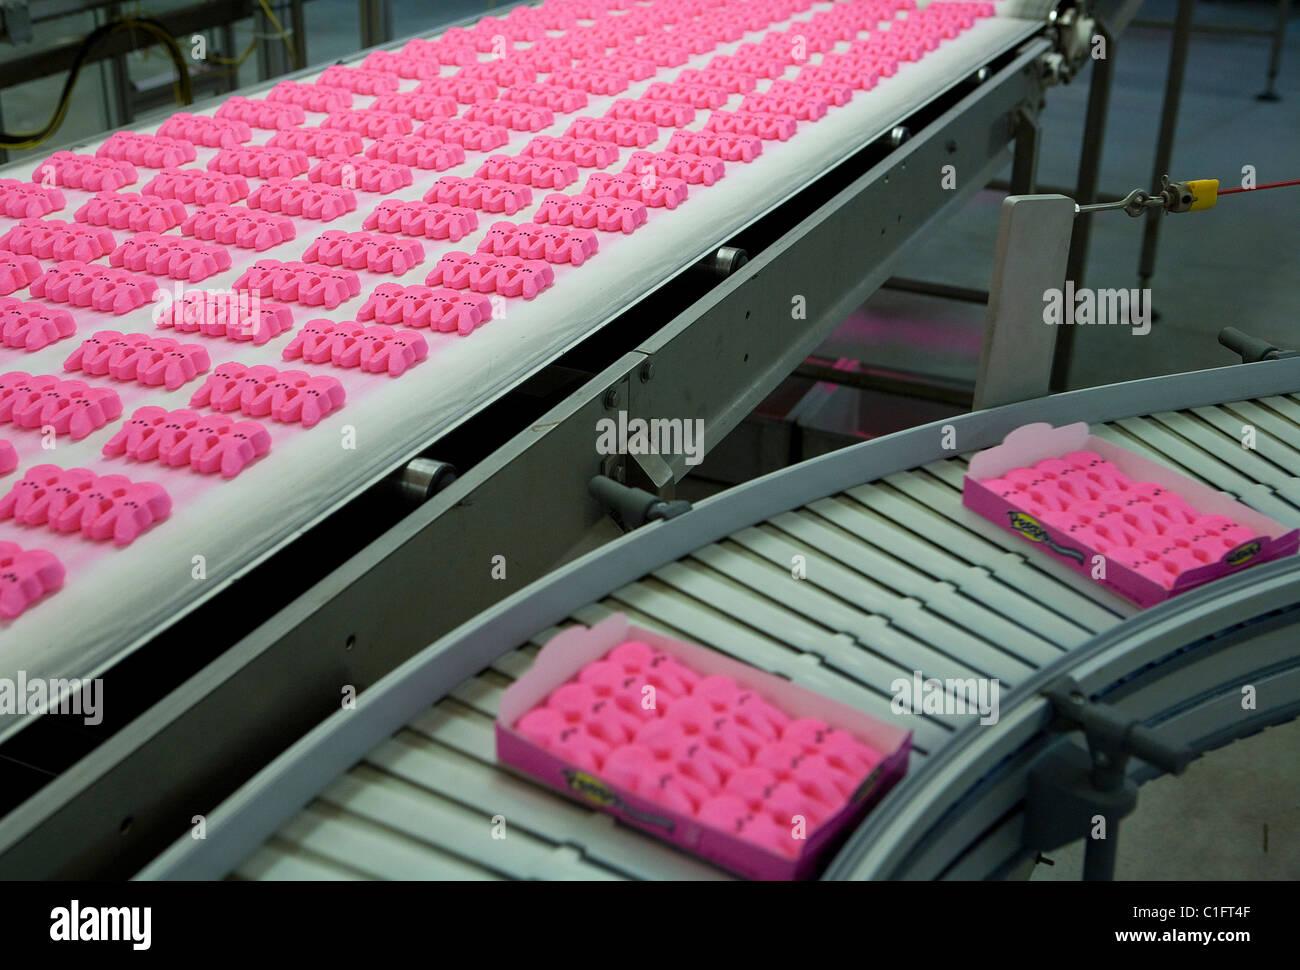 The Marshmallow Peeps factory.  - Stock Image